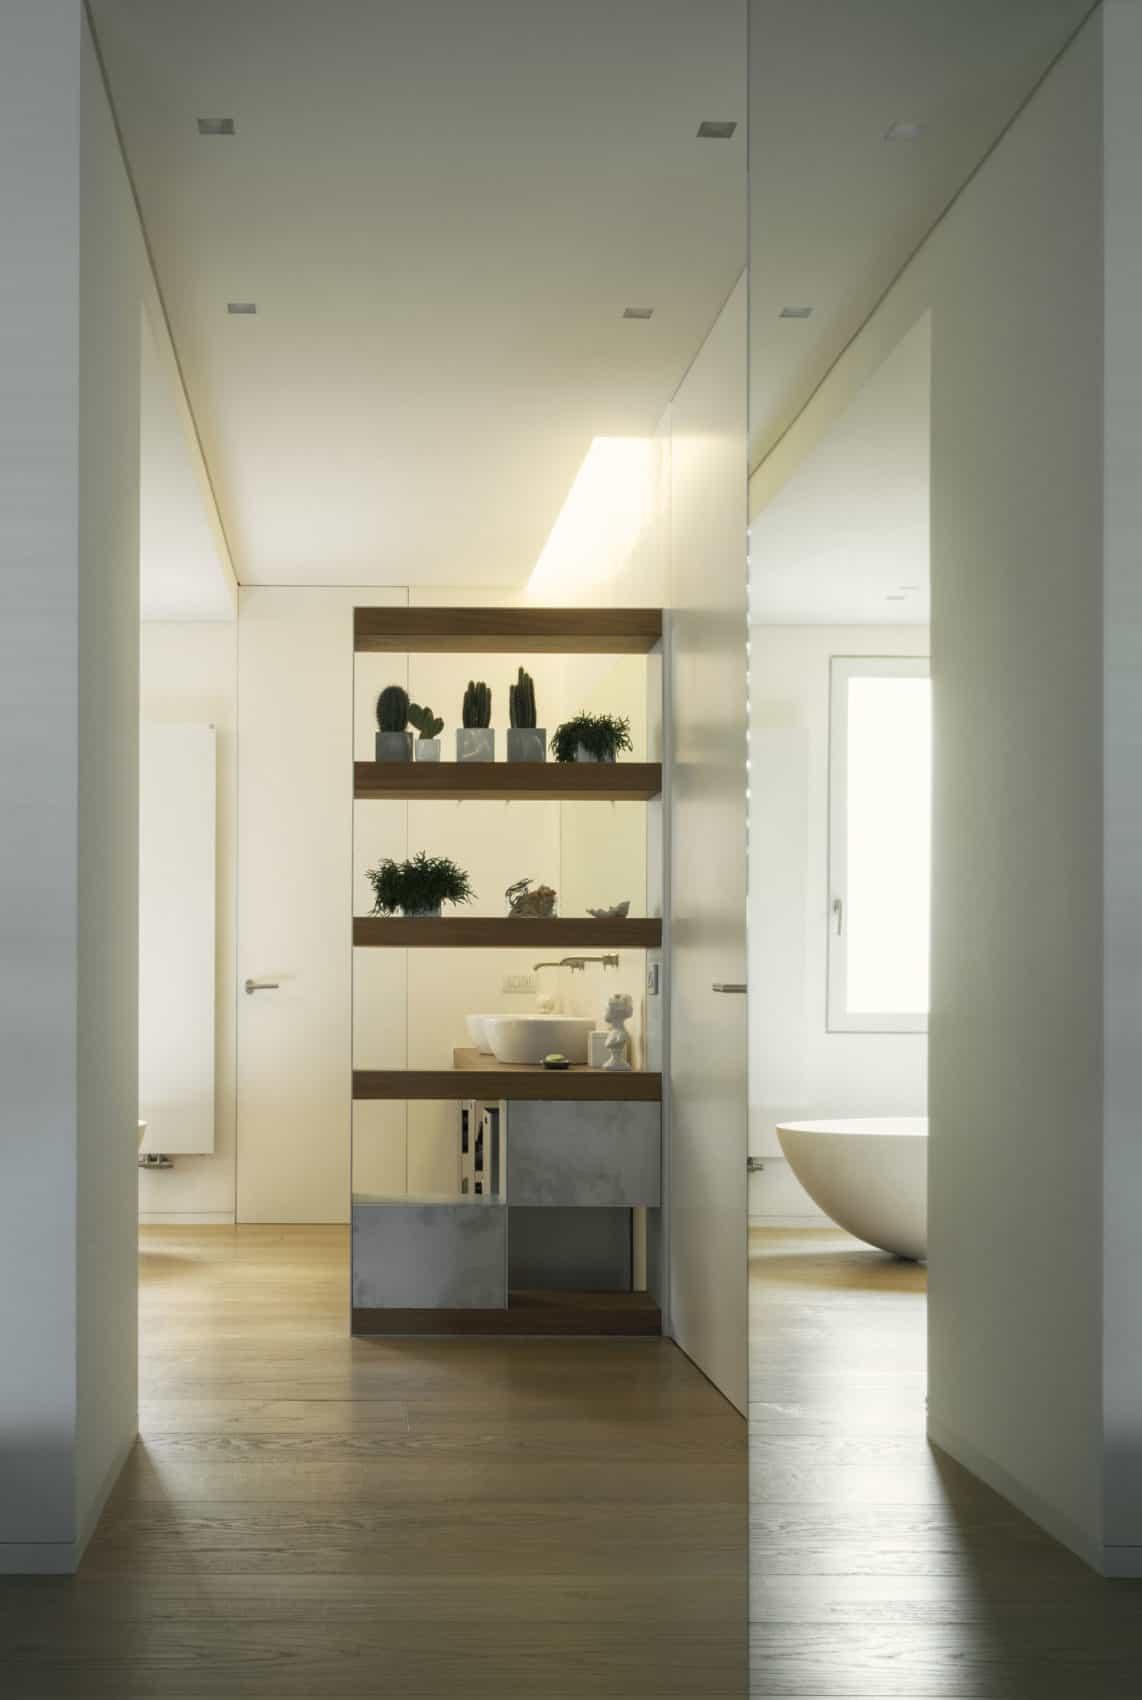 RG-RM Residence by Gobbo Architetti (13)